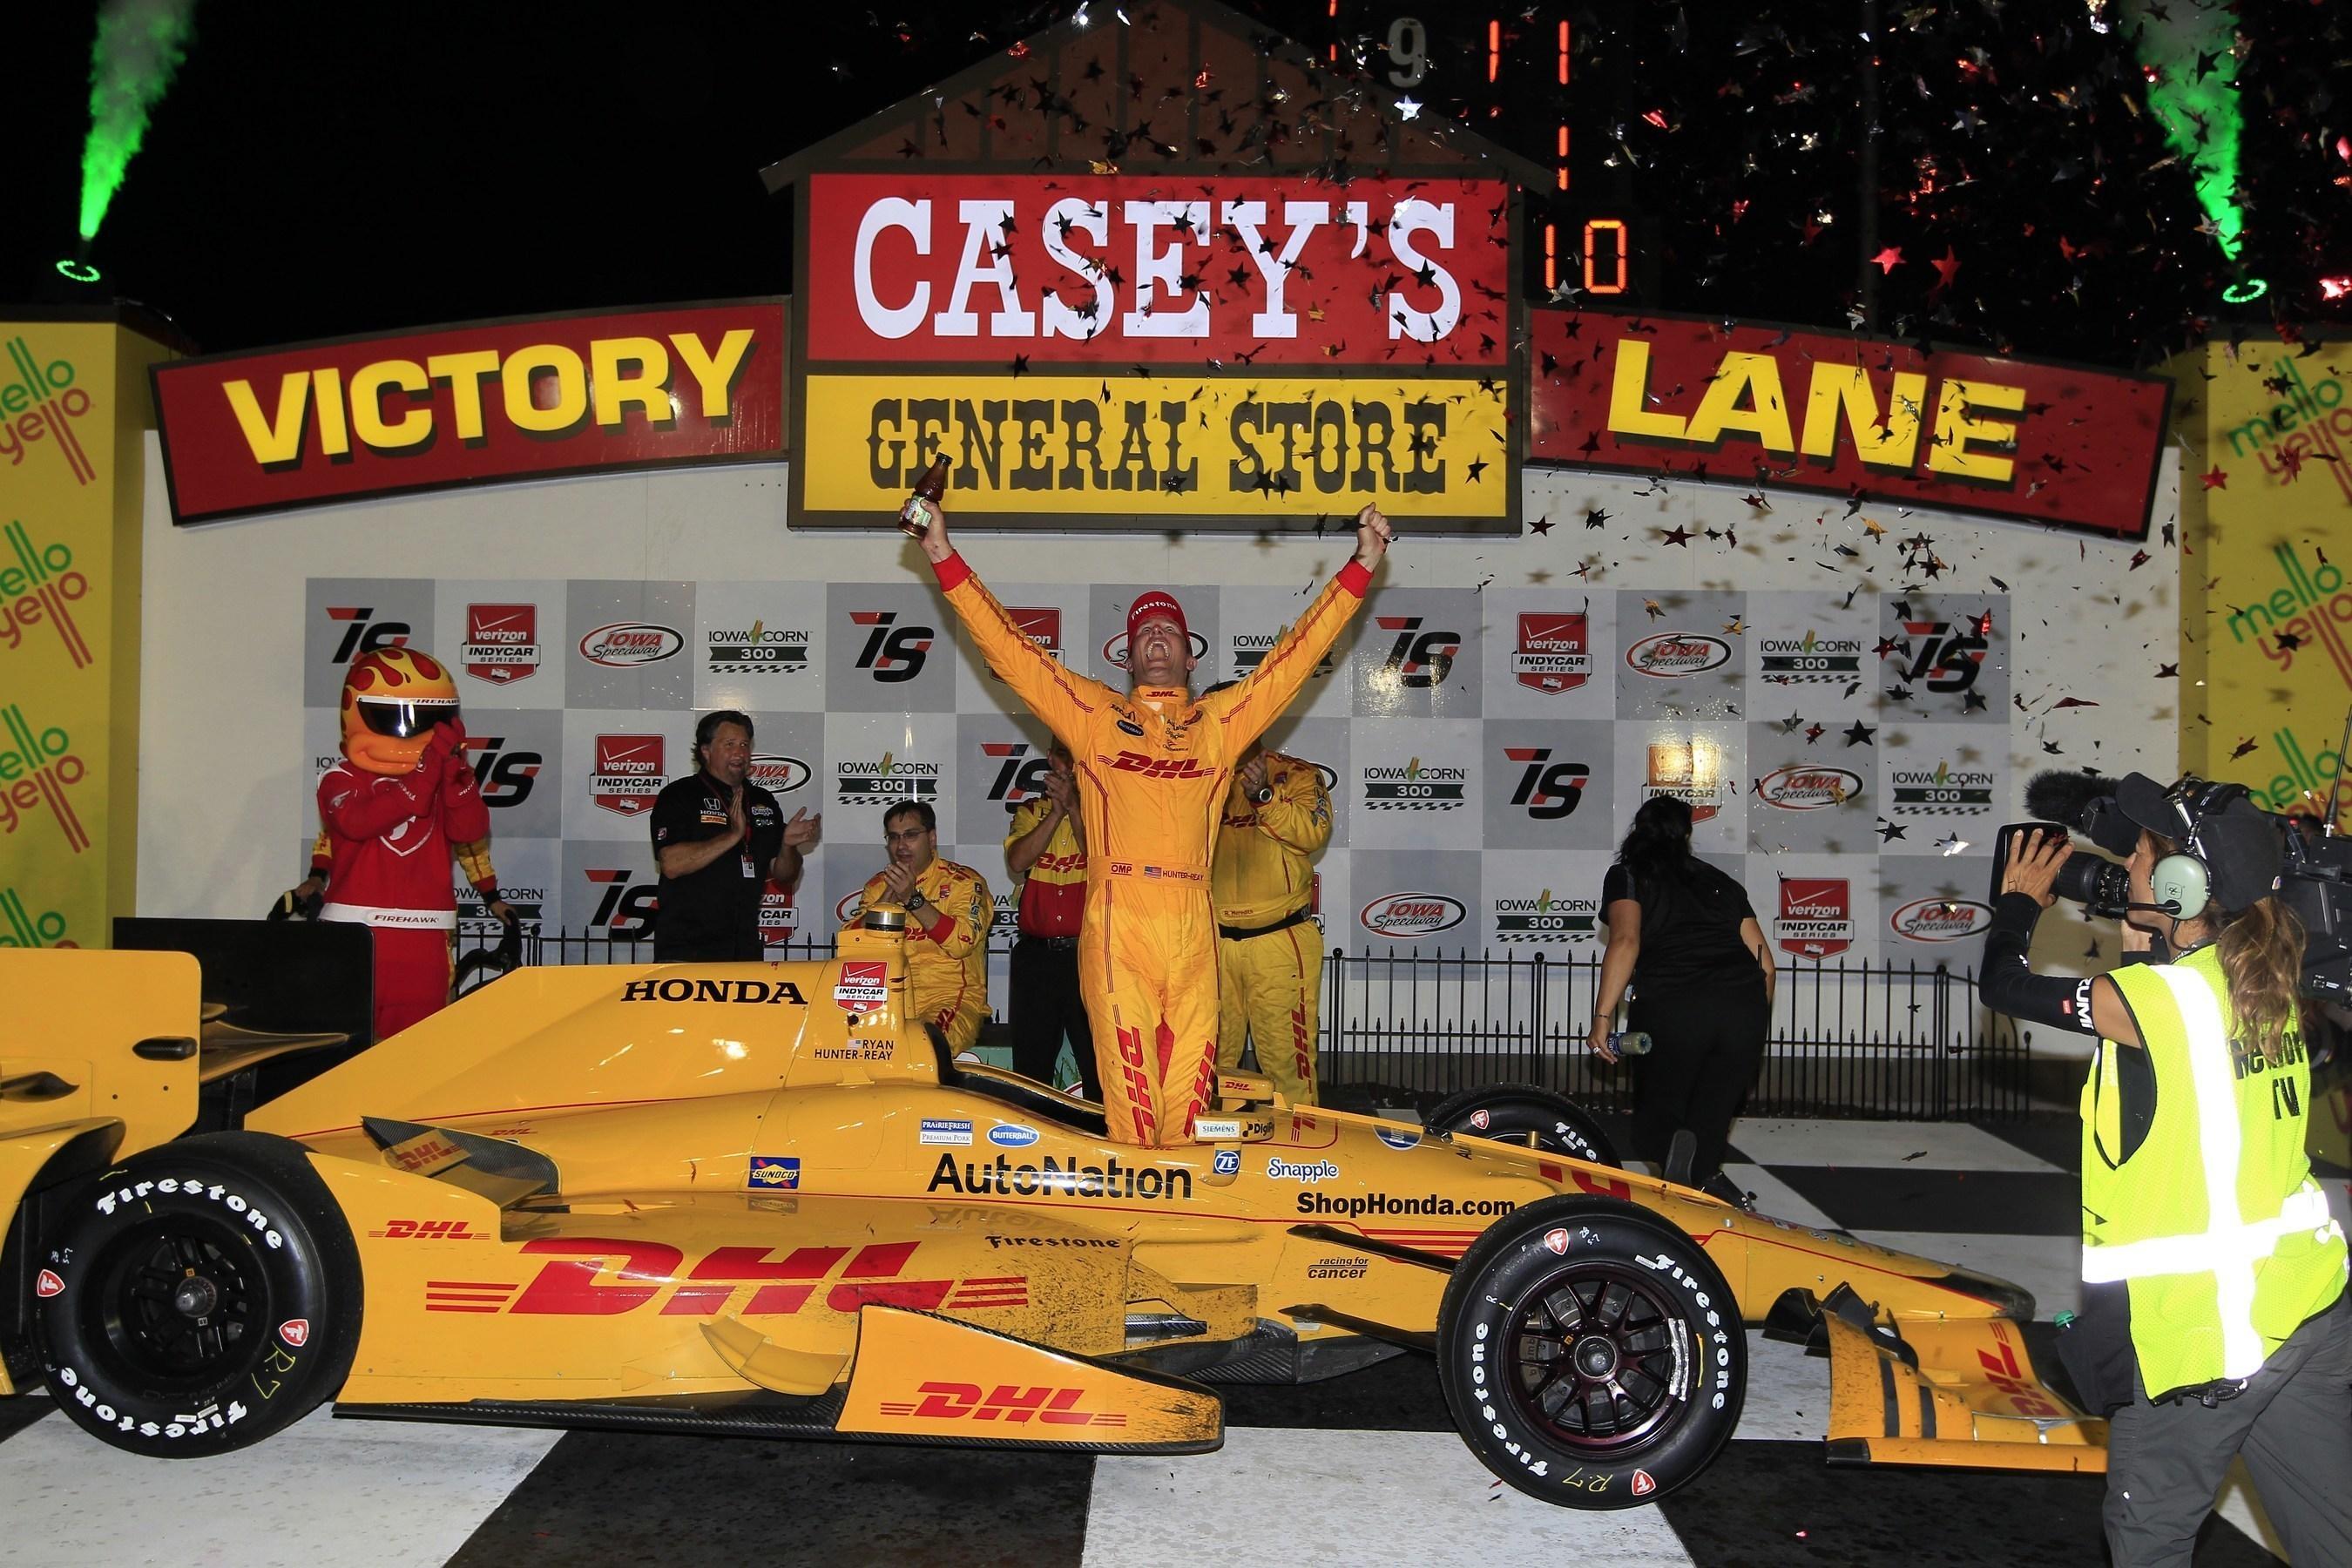 Ryan Hunter-Reay drove his Andretti Autosport Honda IndyCar to victory Saturday night at Iowa Speedway